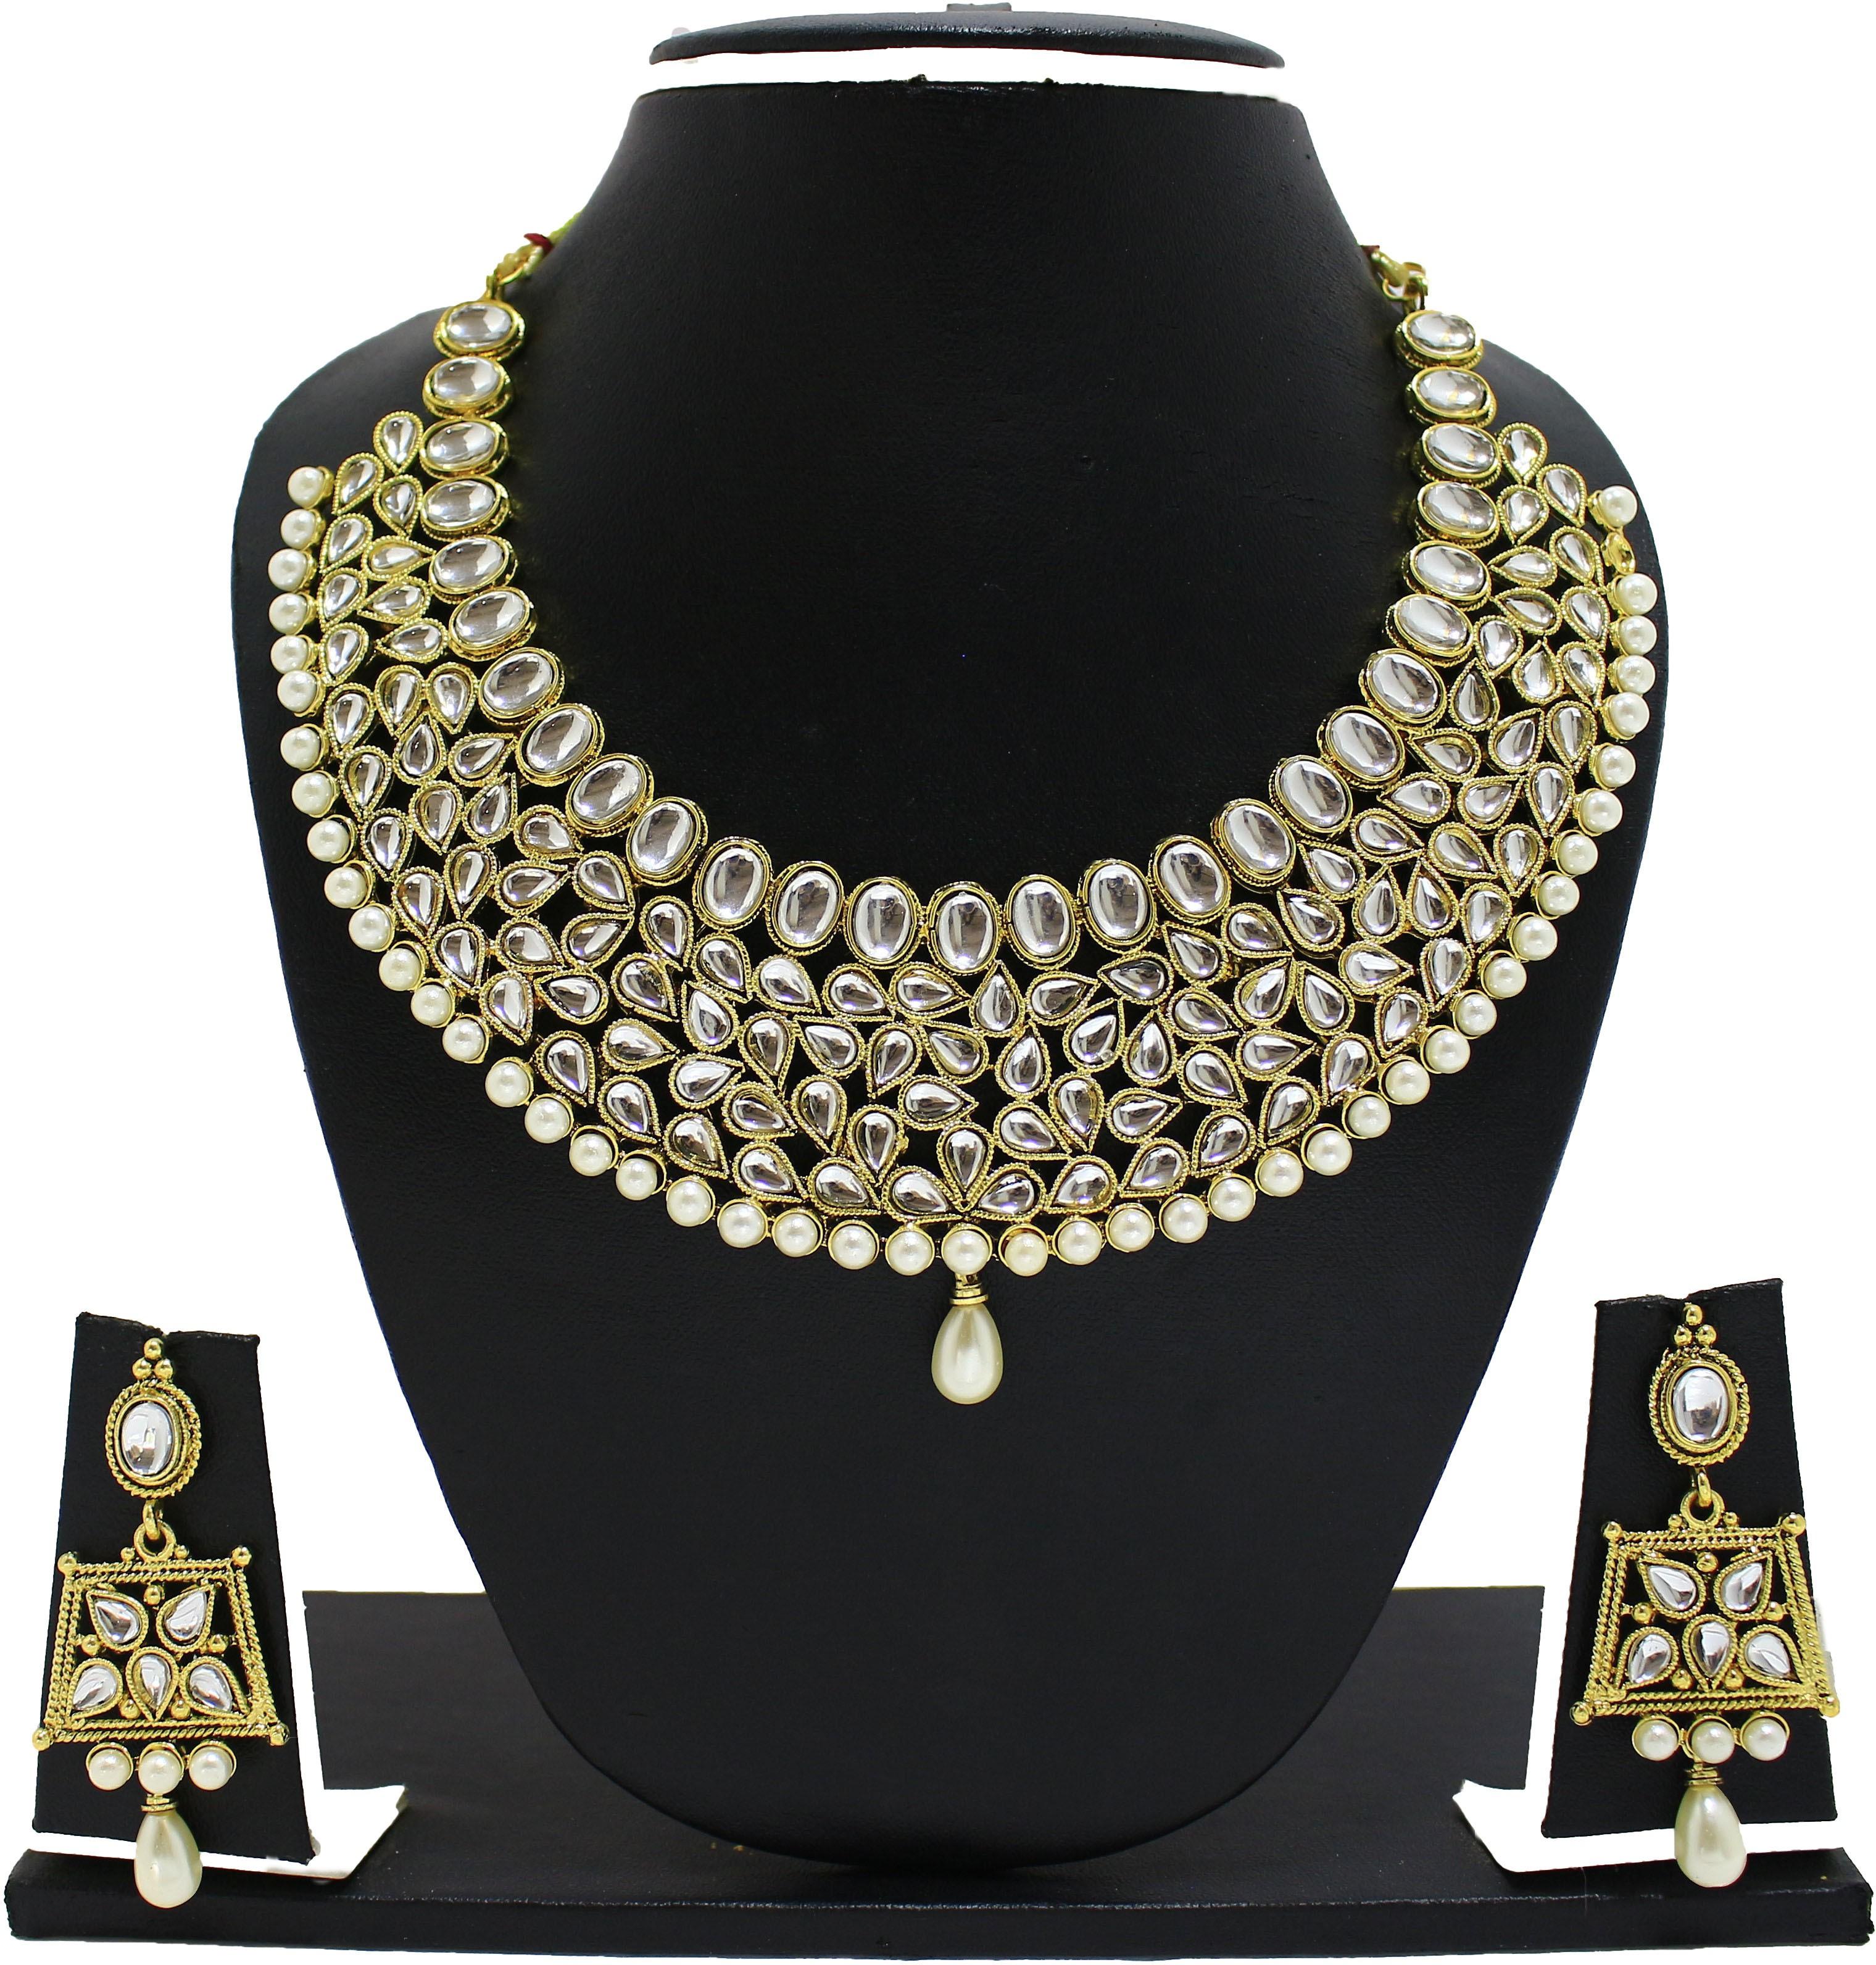 Deals - Delhi - Top Picks <br> Earrings, Pendants,Rings...<br> Category - jewellery<br> Business - Flipkart.com